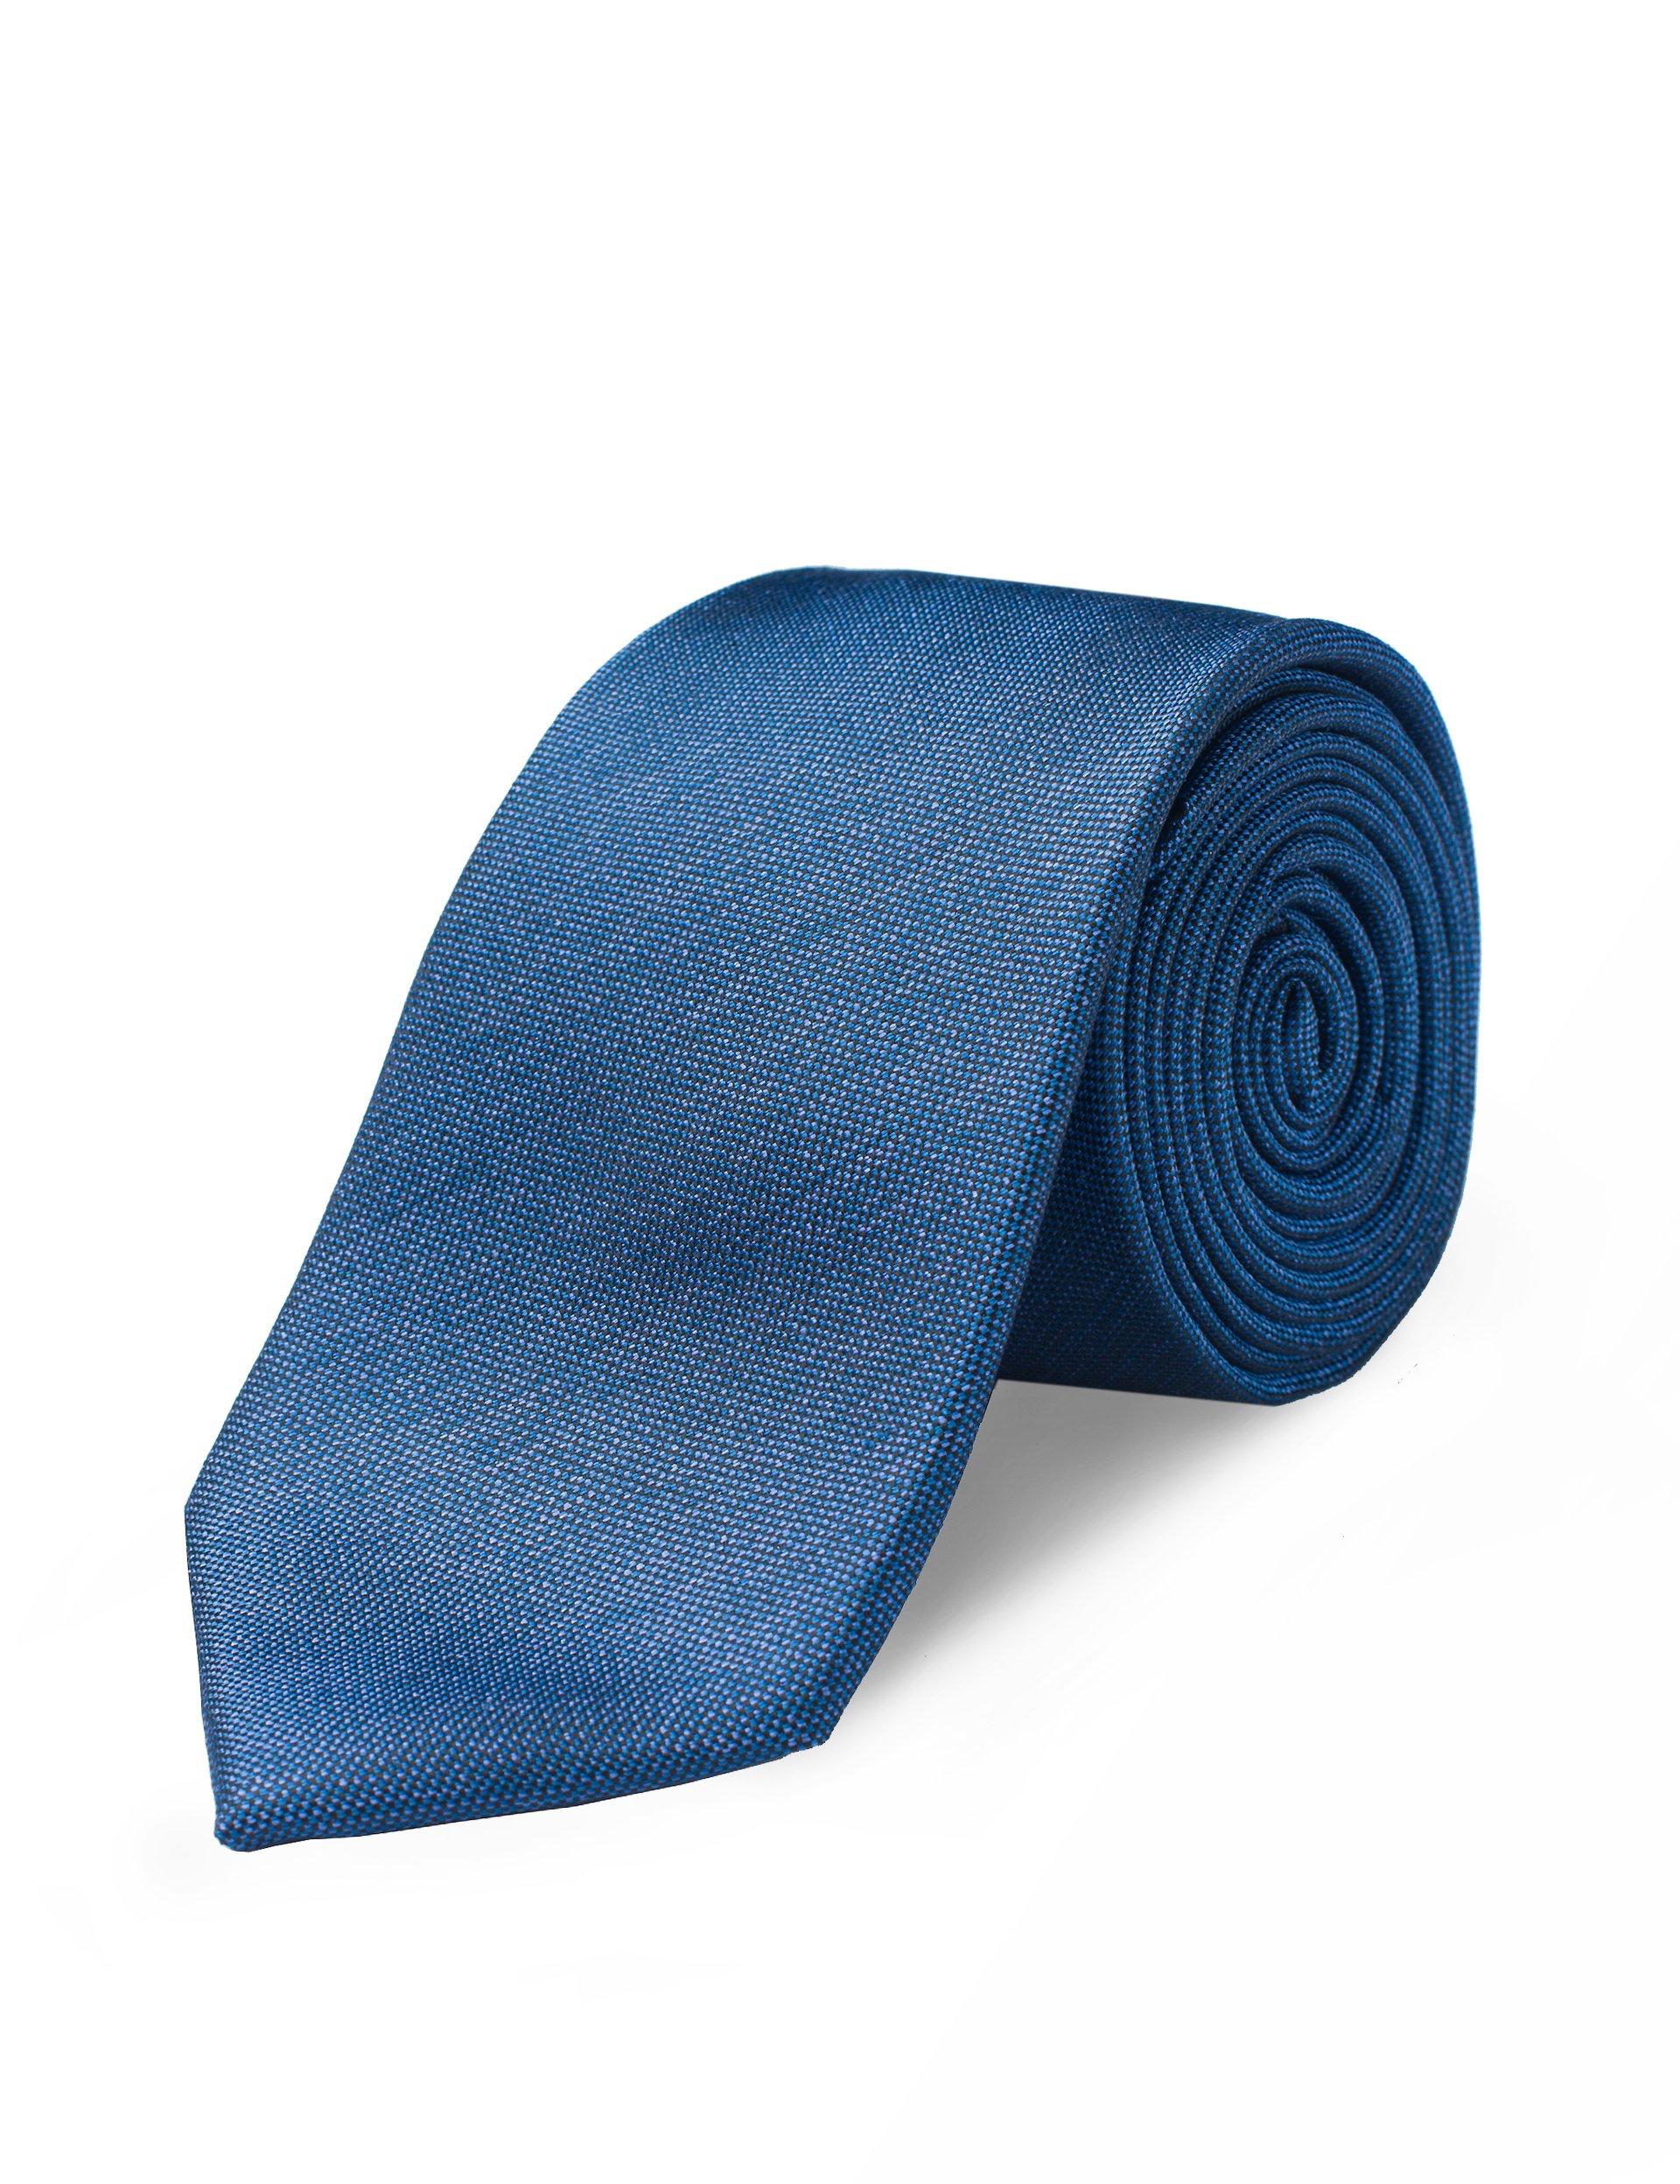 Origin Ties Mens Fashion Handmade 100% Silk Textured 2.5'' Tie Solid Navy Skinny Tie with Gift Box